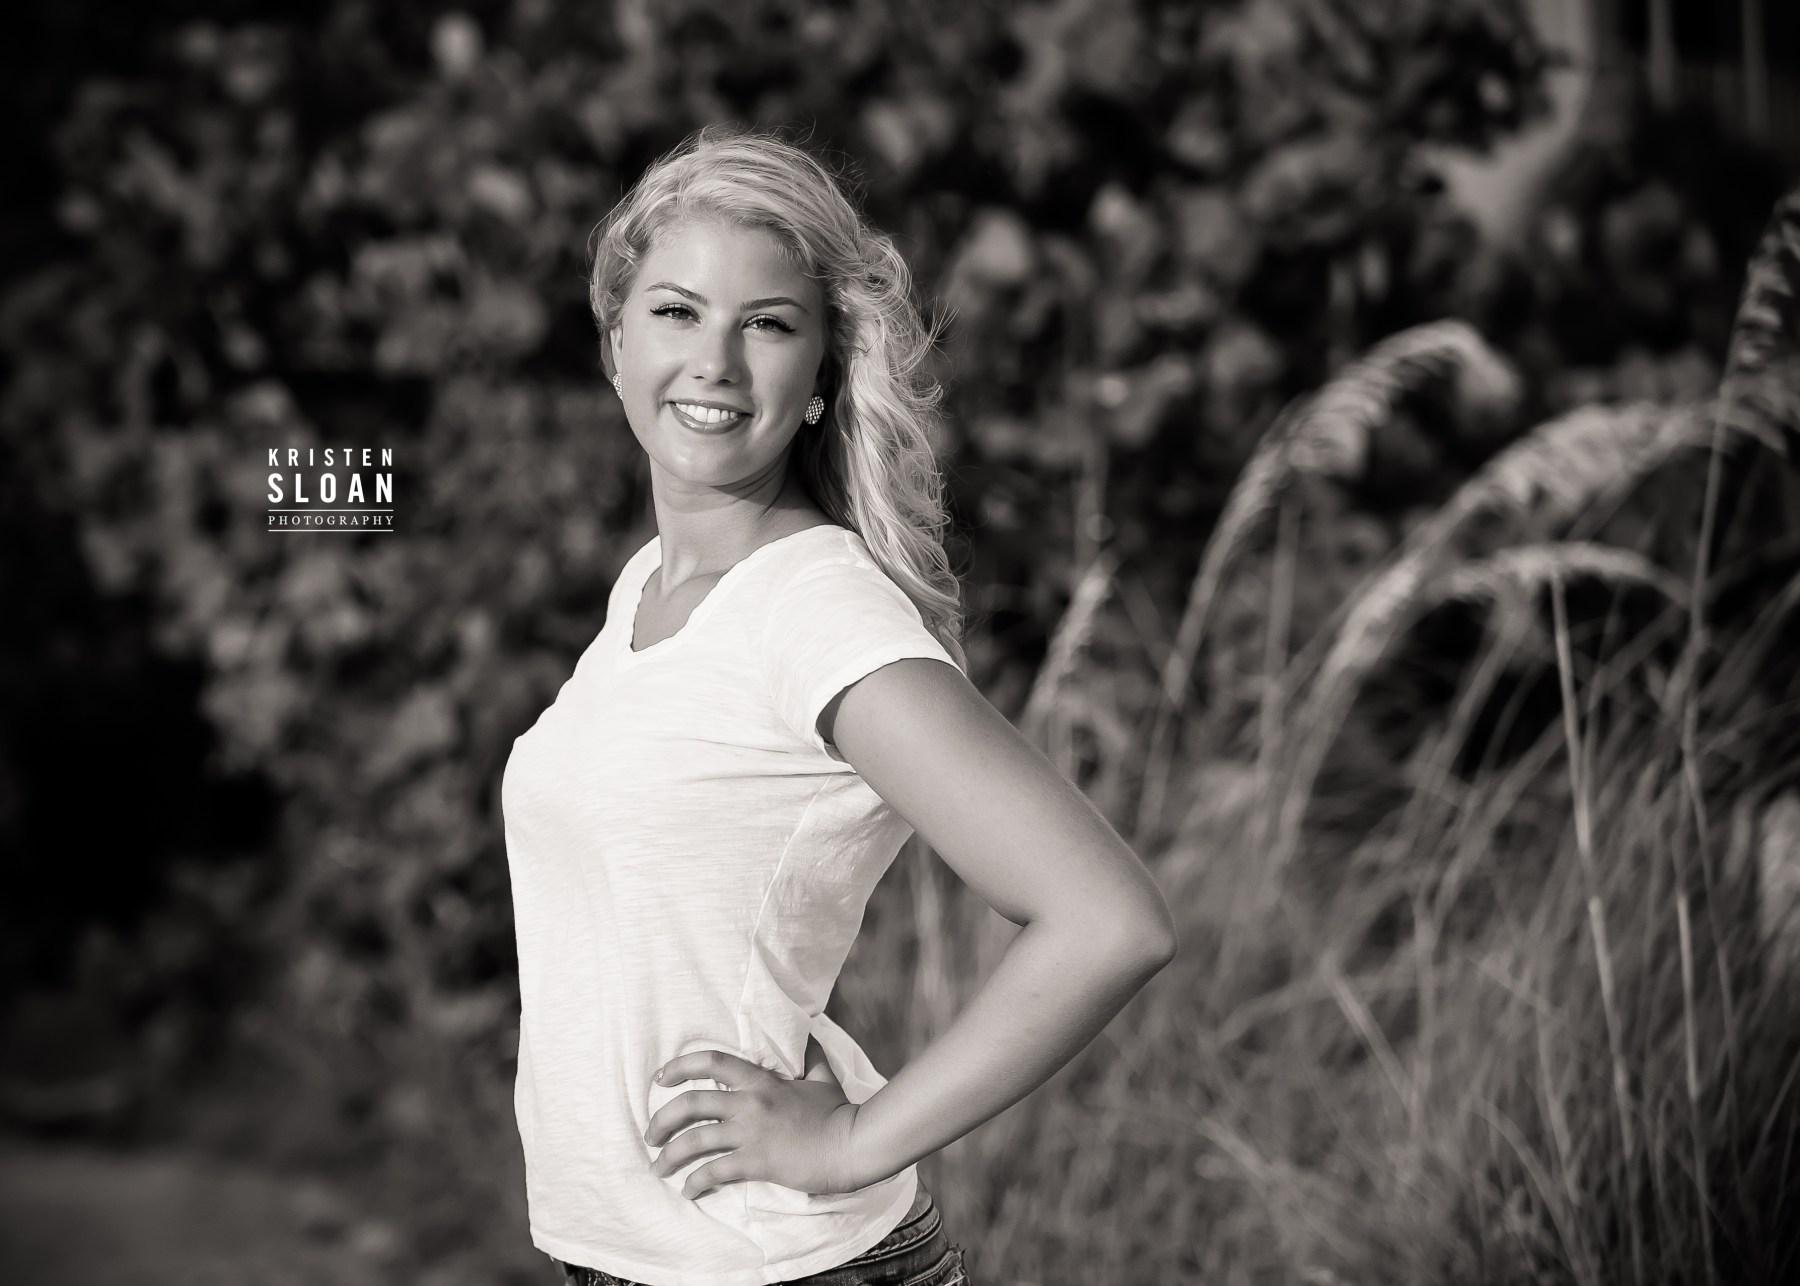 TradeWinds Resort St Pete Beach FL High School Senior Portraits by Photographer Kristen Sloan